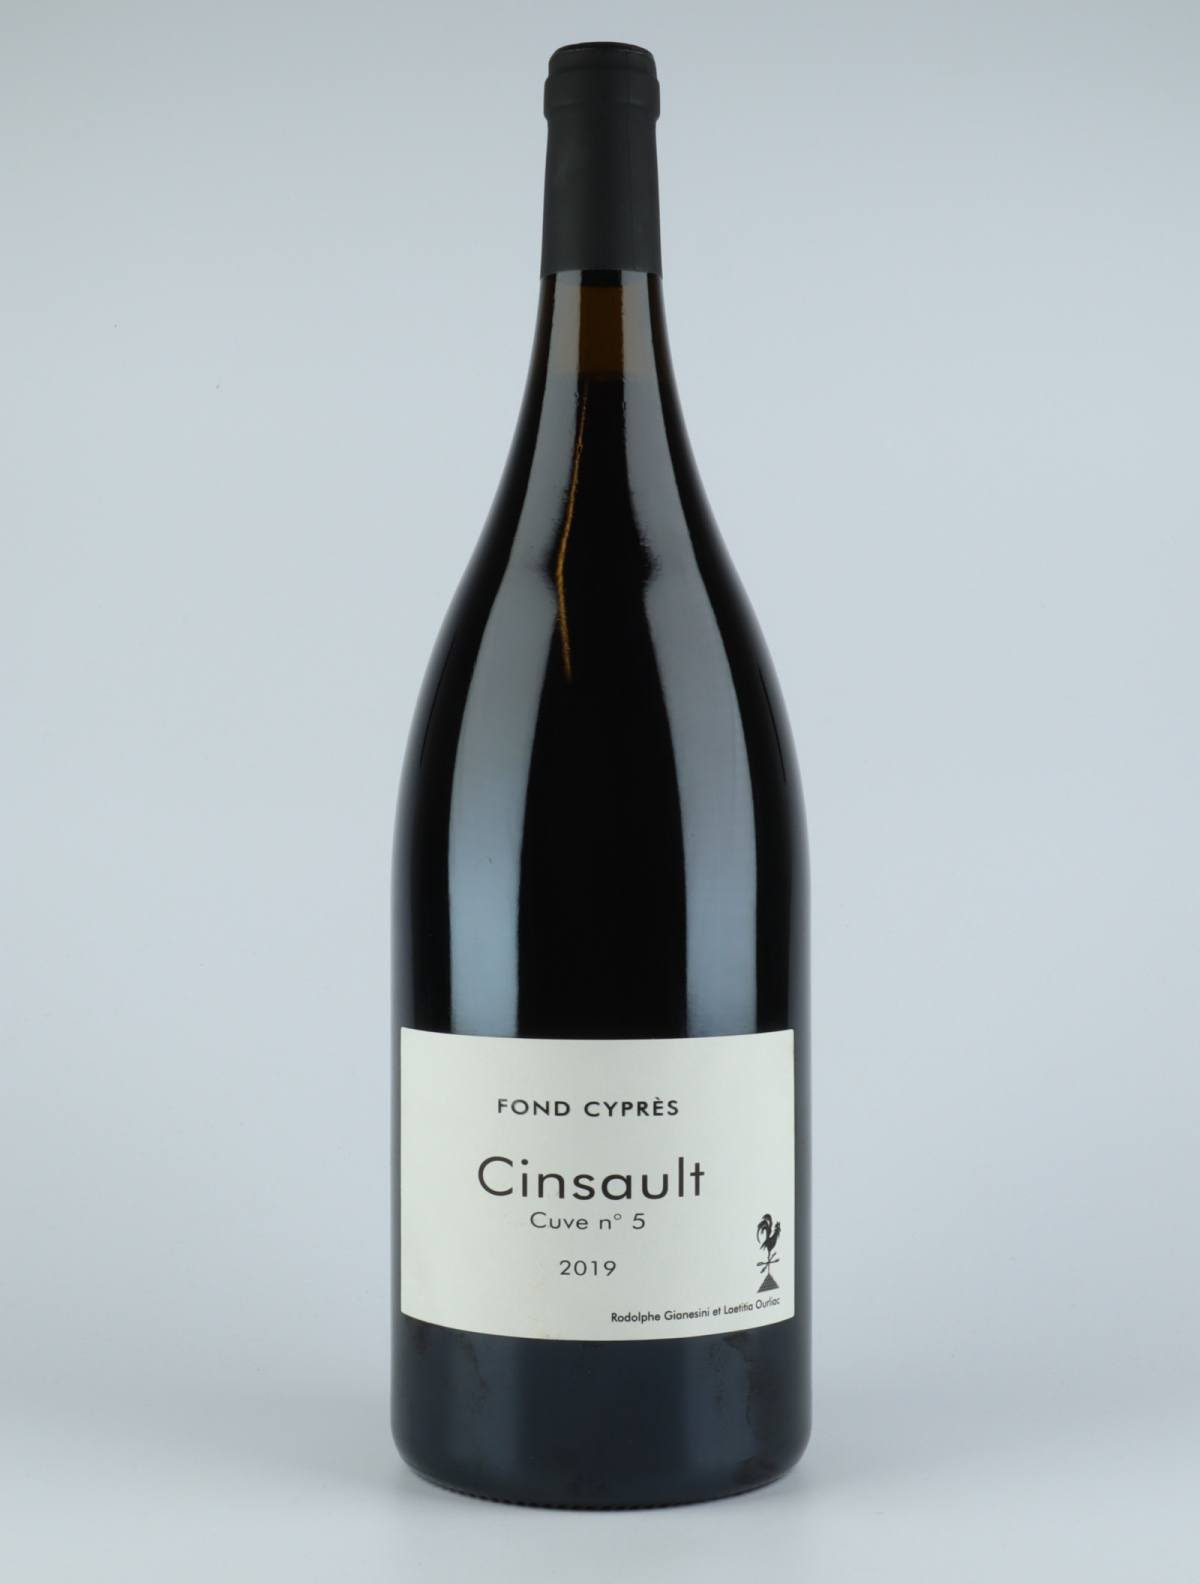 Cinsault Cuve No. 5